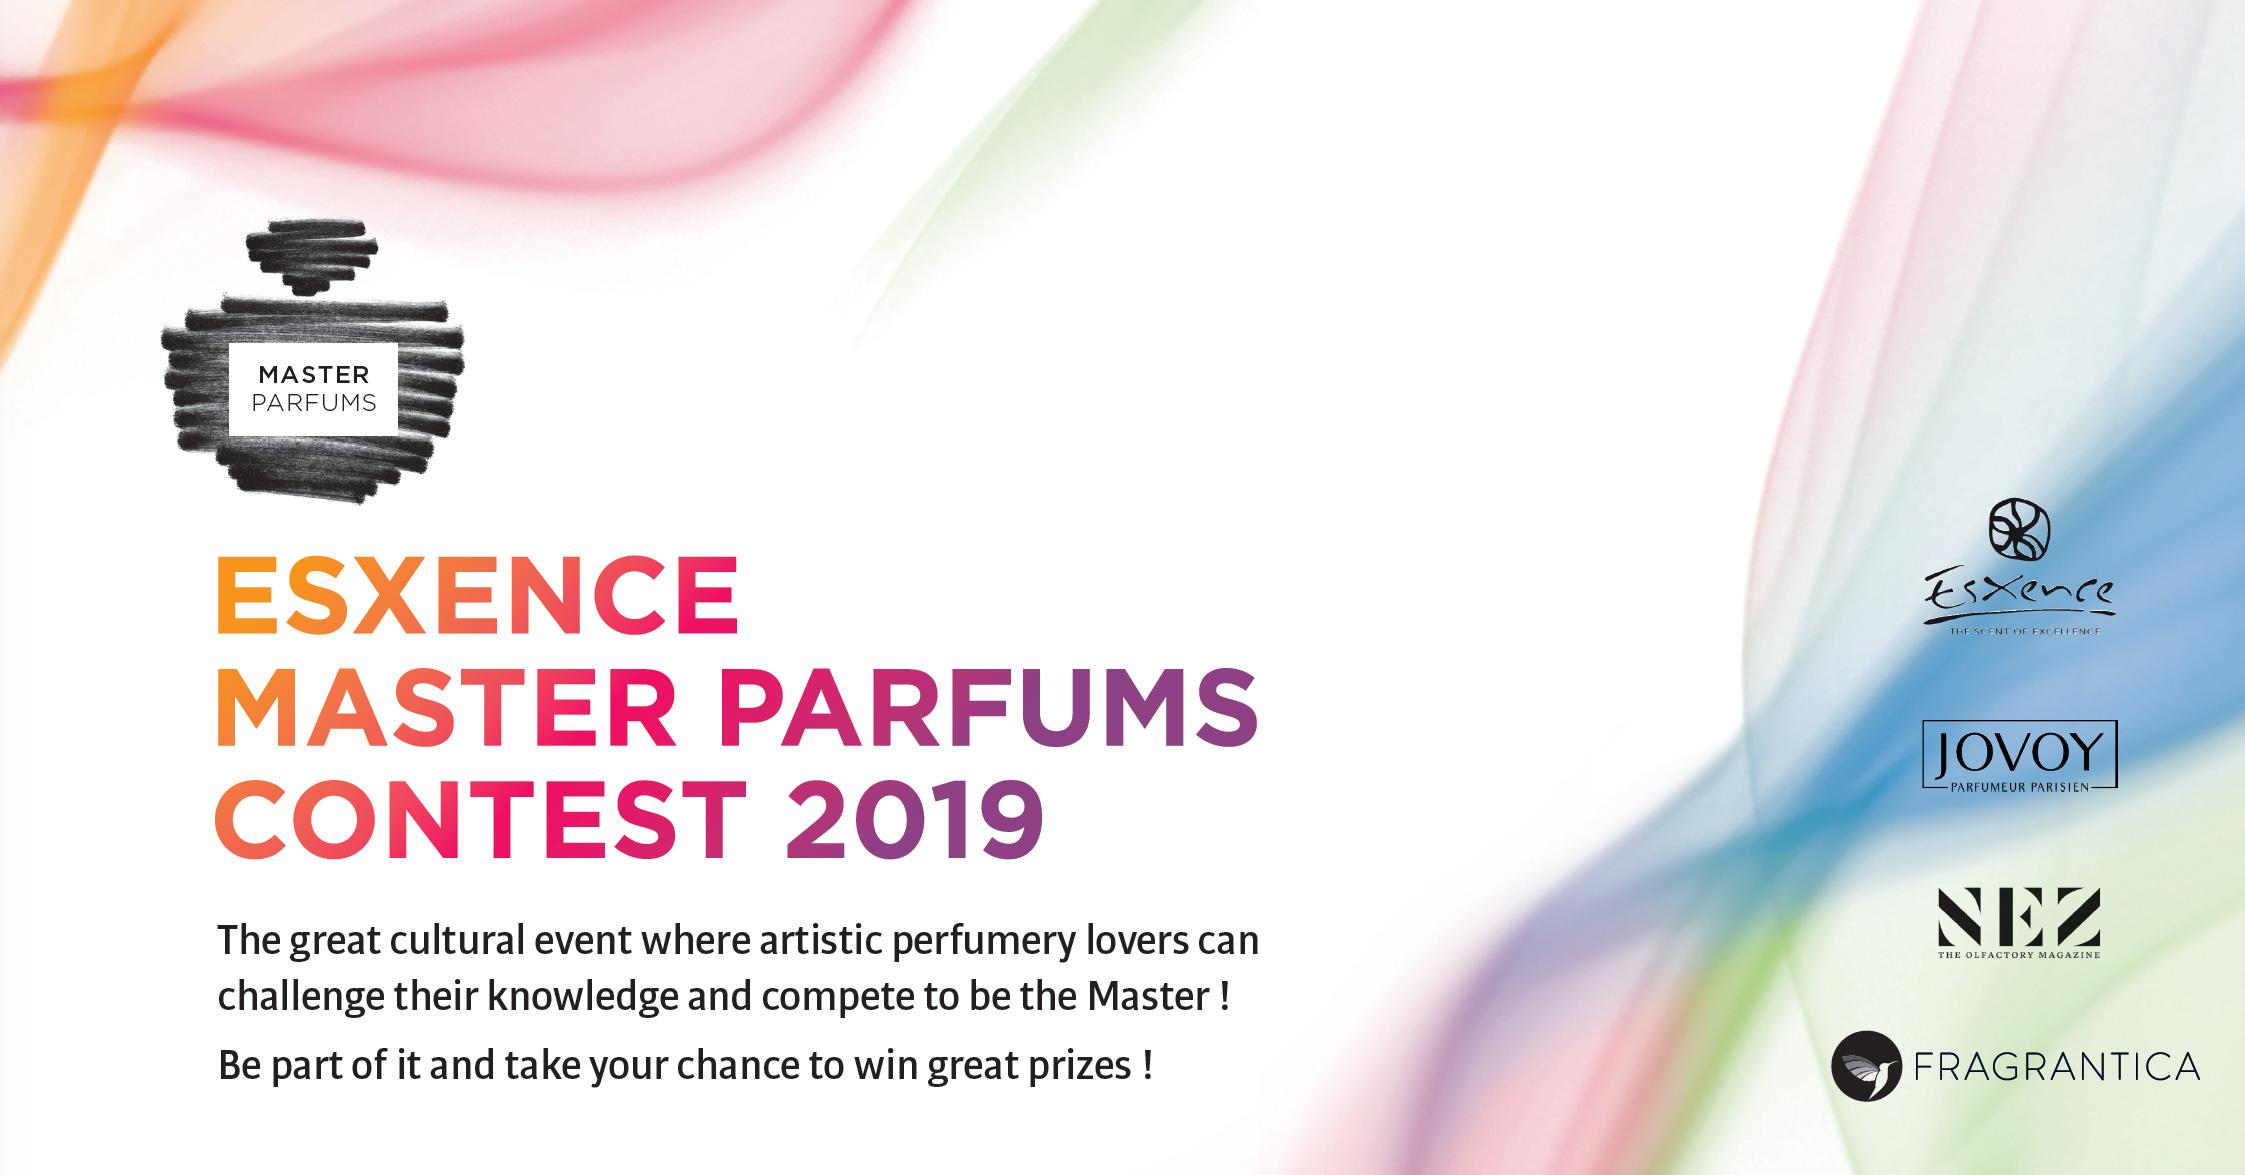 ESXENCE: Master Parfums Contest 2019 ~ Art Books Events